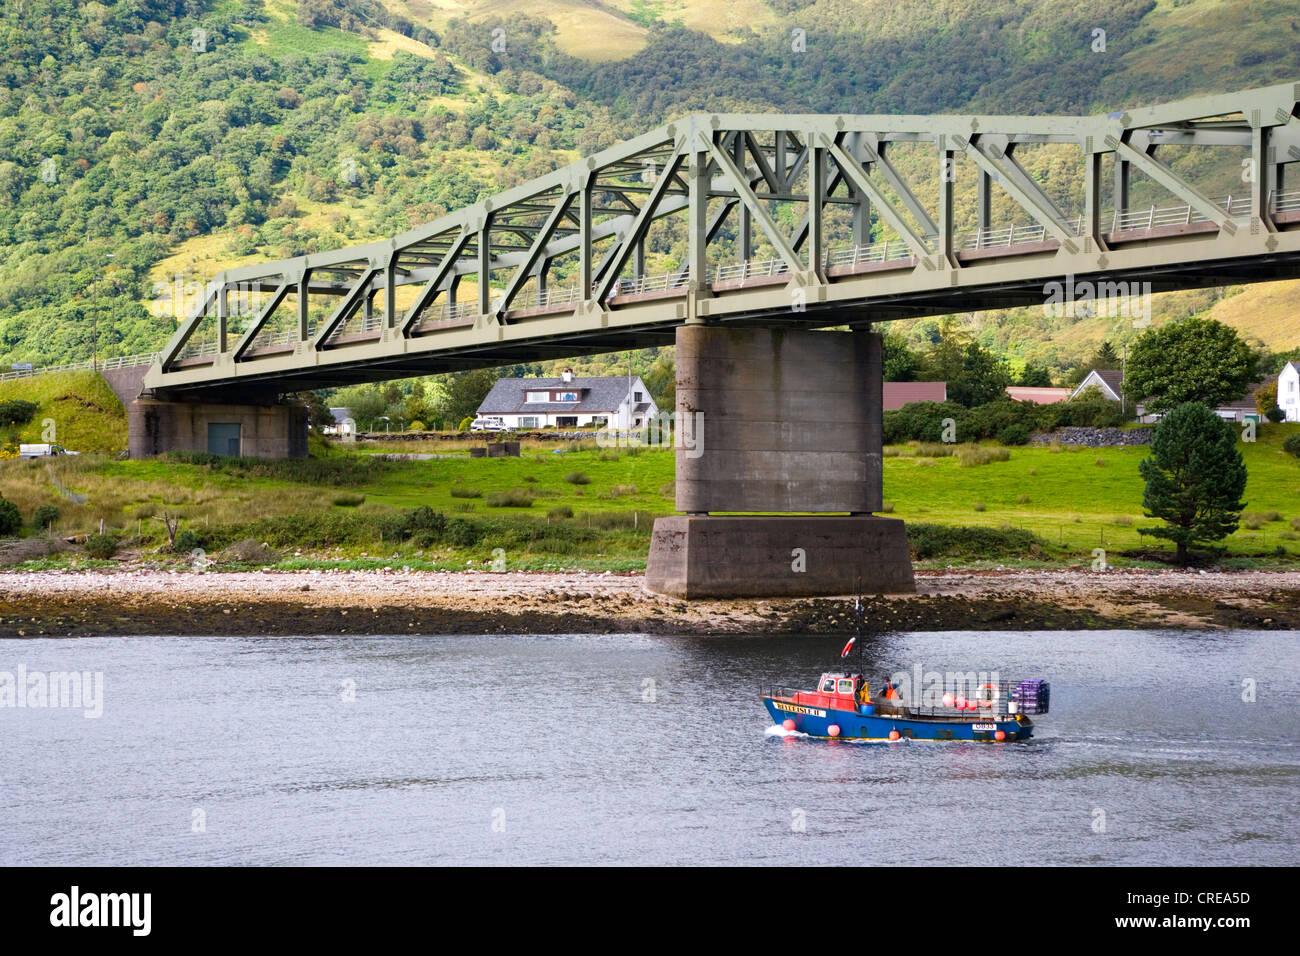 View of Ballachulish Bridge across Loch Leven from South Ballachulish looking to North Ballachulish Scotland - Stock Image